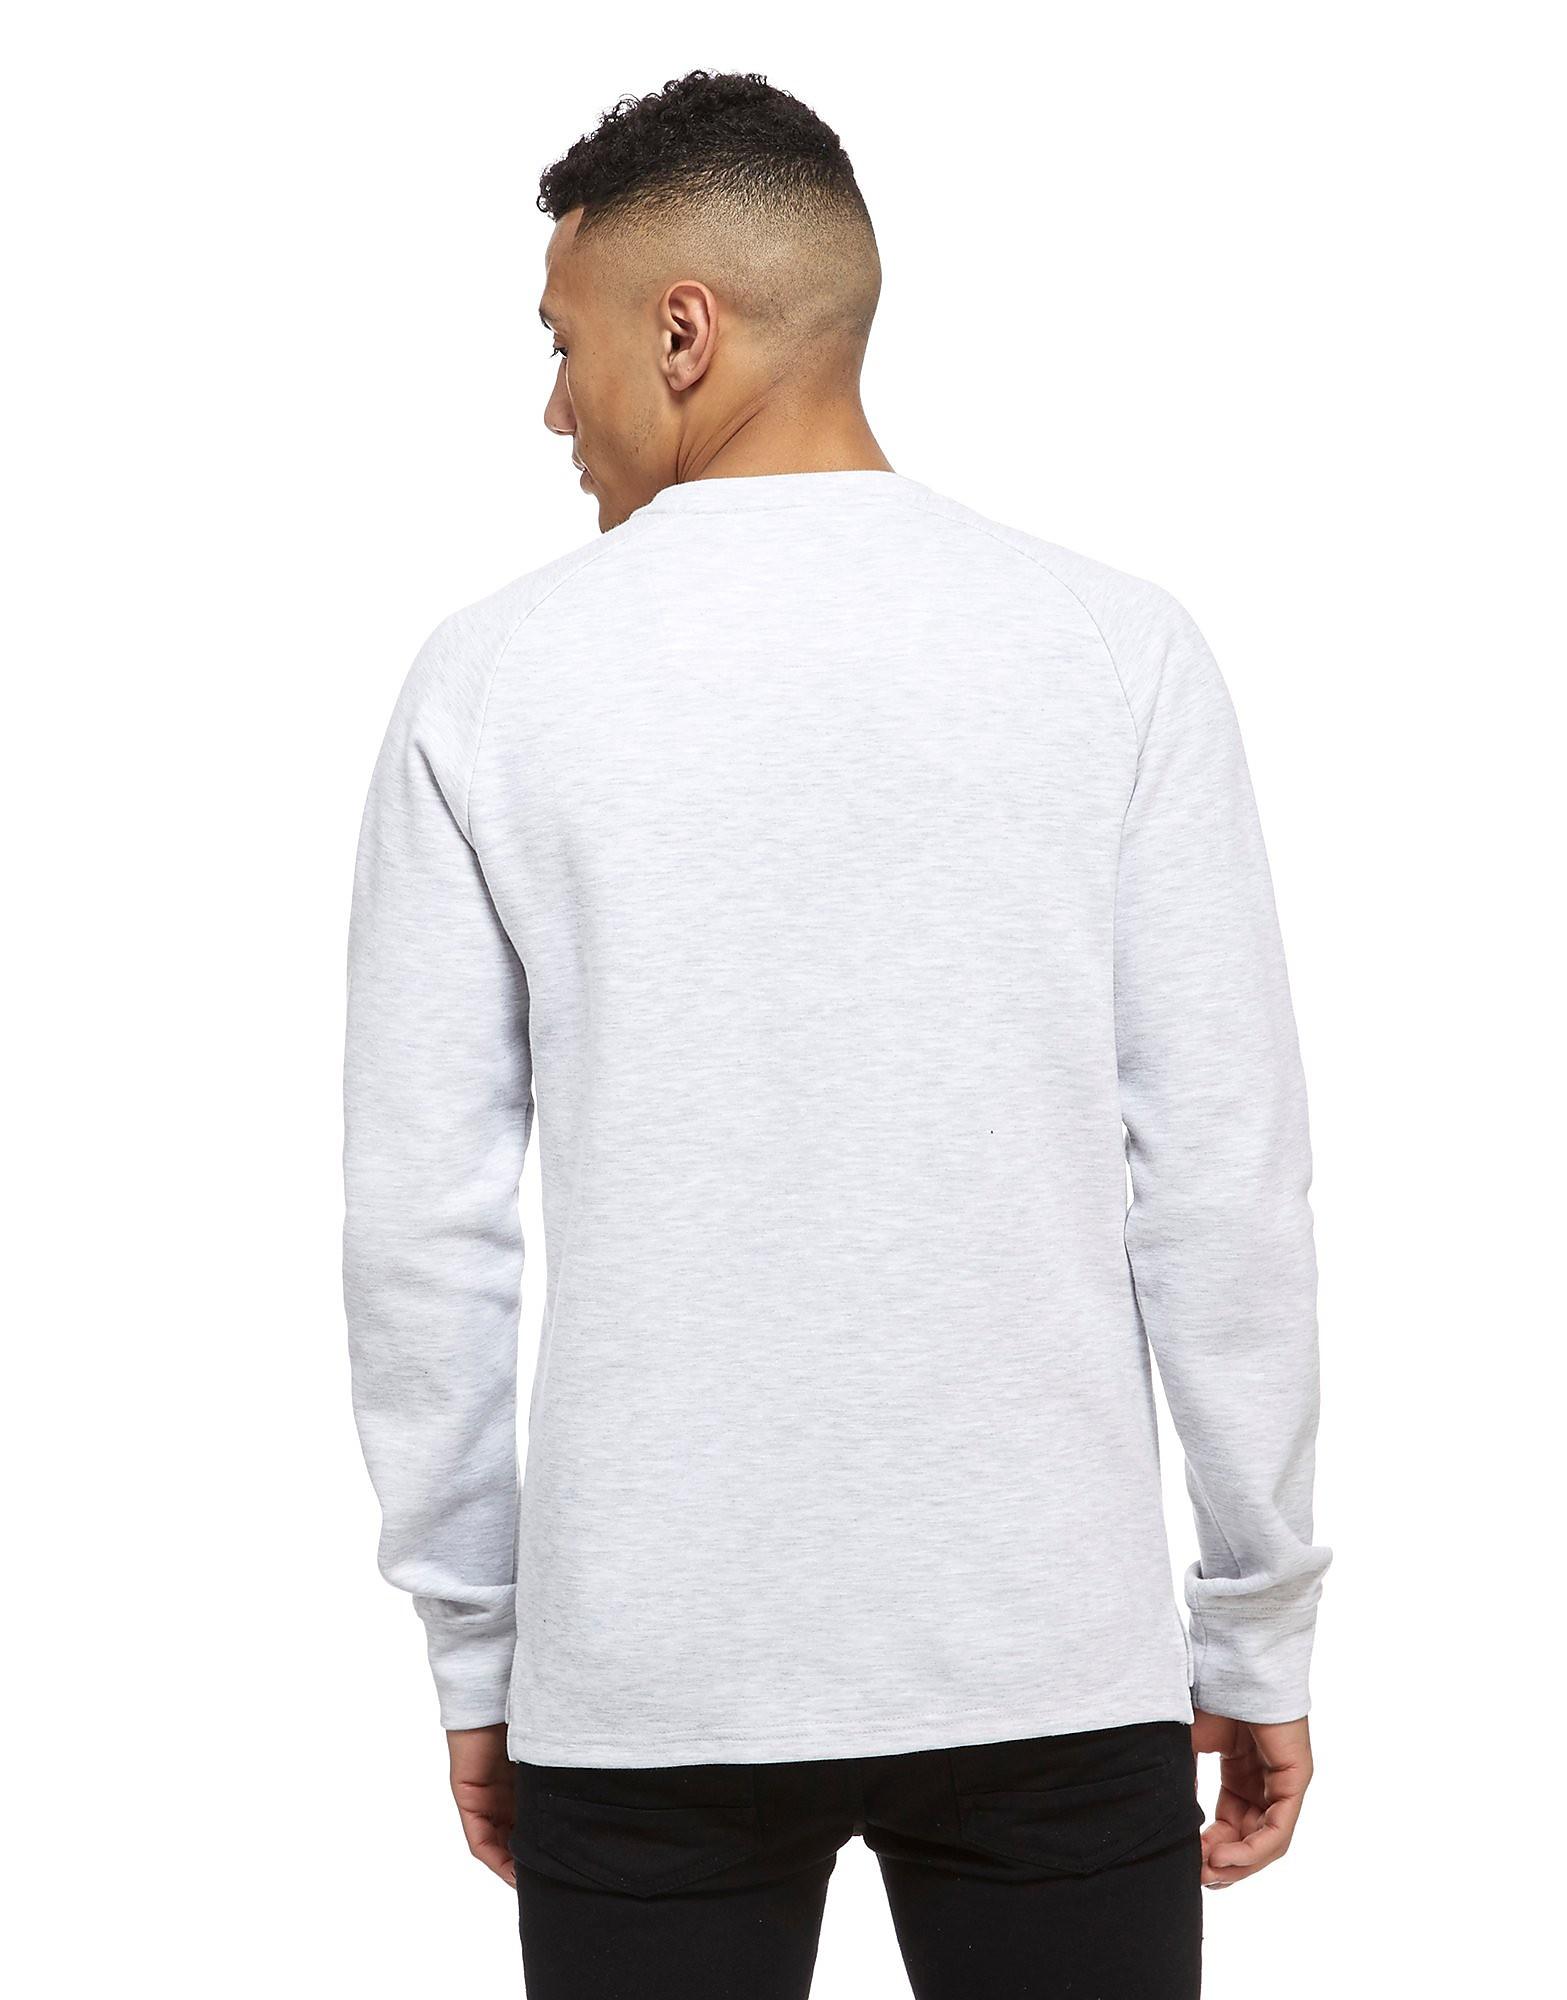 Duffer of St George Presence Crew Sweatshirt